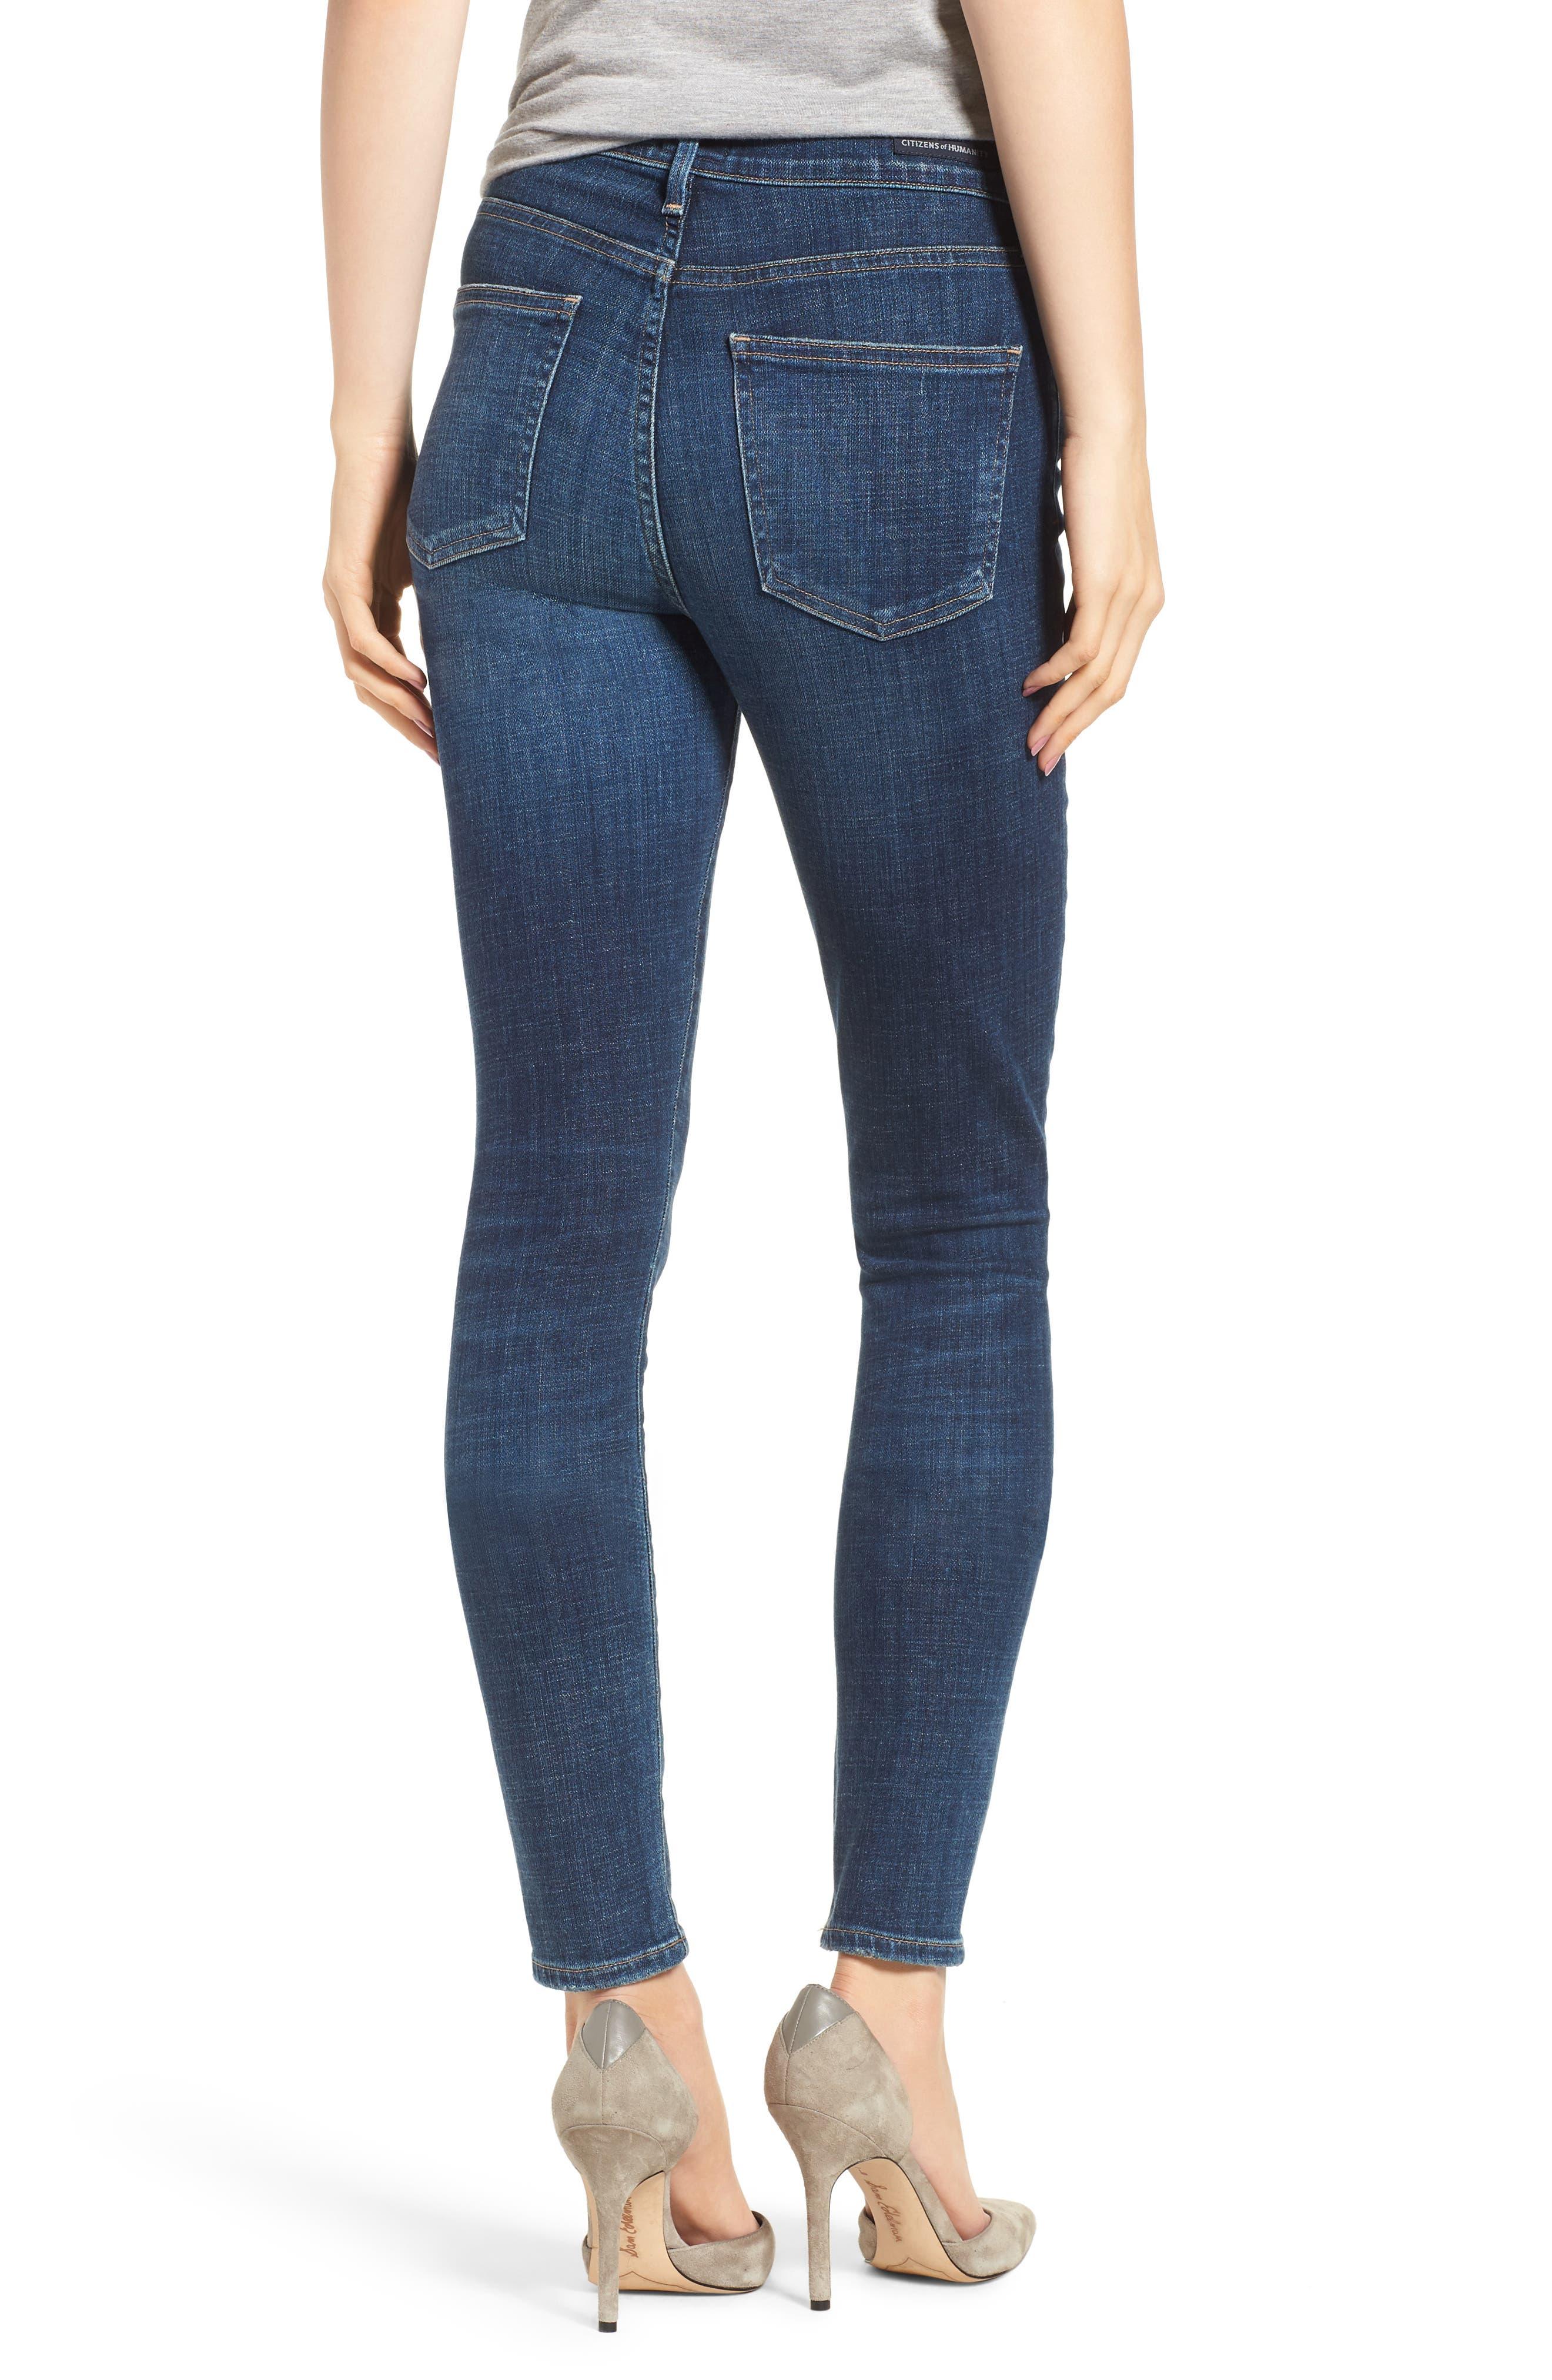 Rocket High Waist Skinny Jeans,                             Alternate thumbnail 2, color,                             428